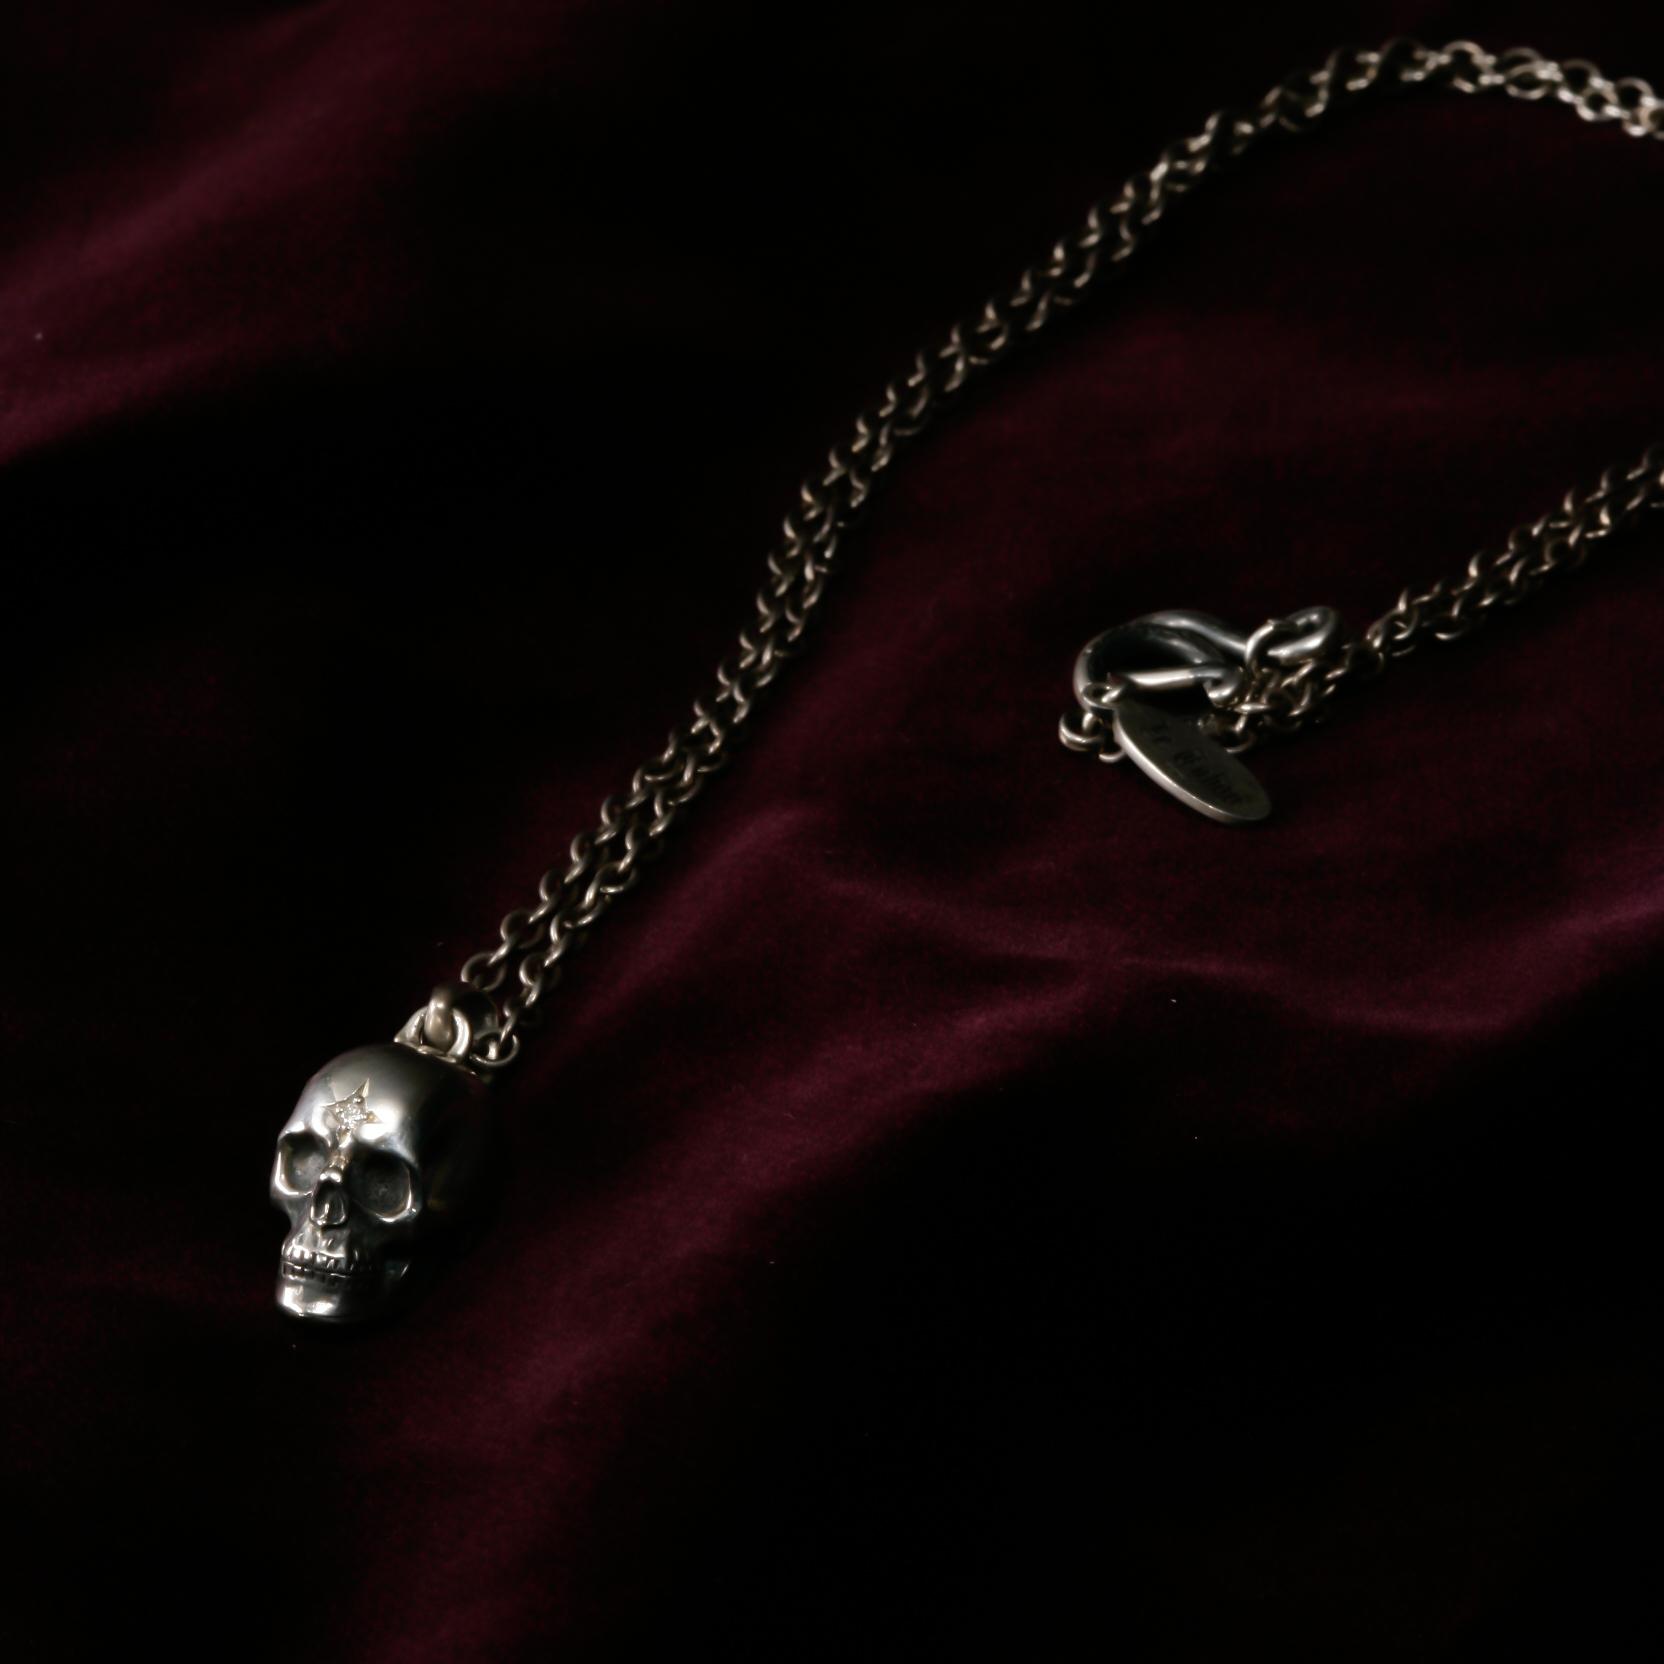 Skull Chakra Diamond in the cross